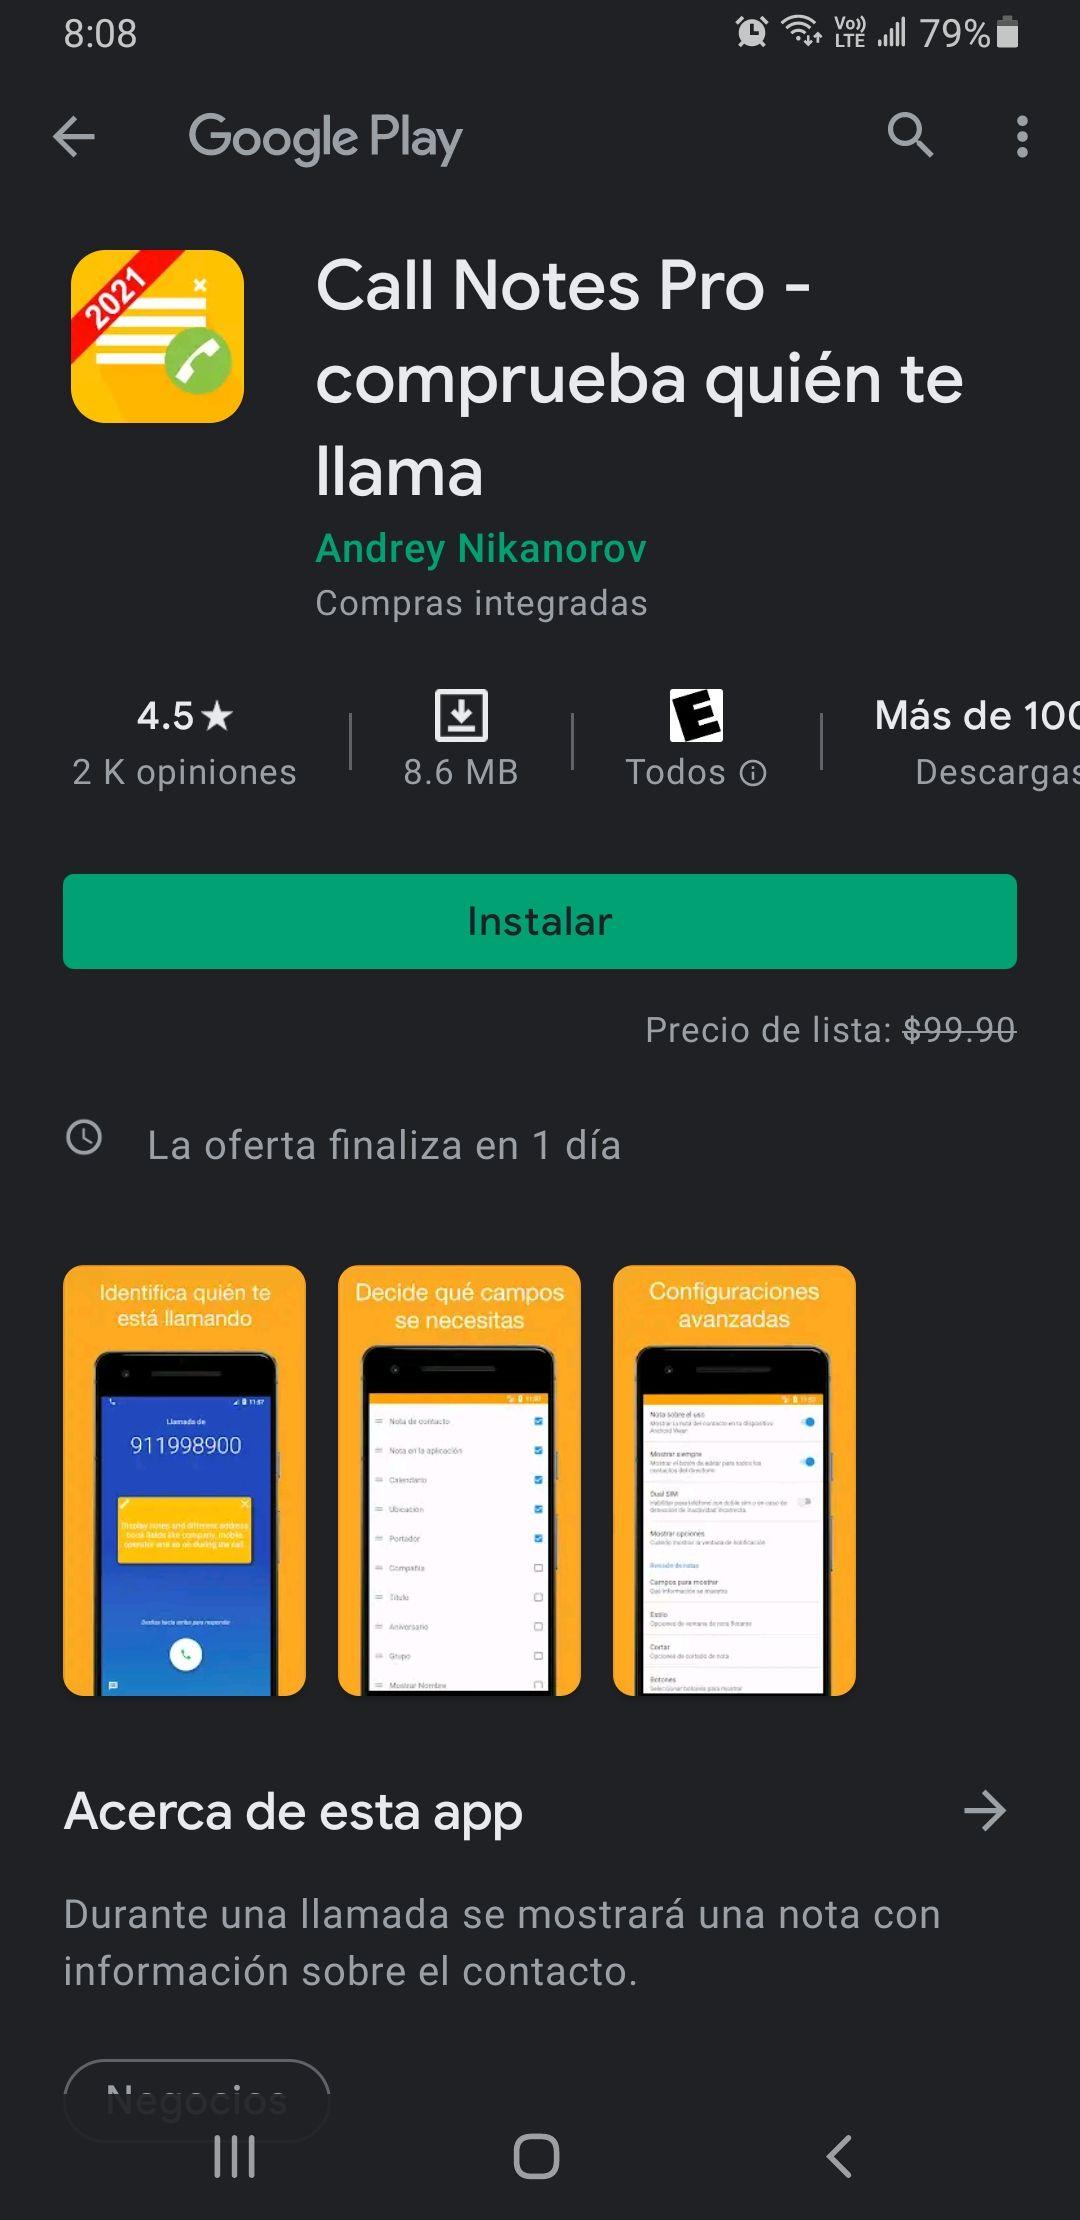 Google Play: Call Notes pro Comprueba quién te llama